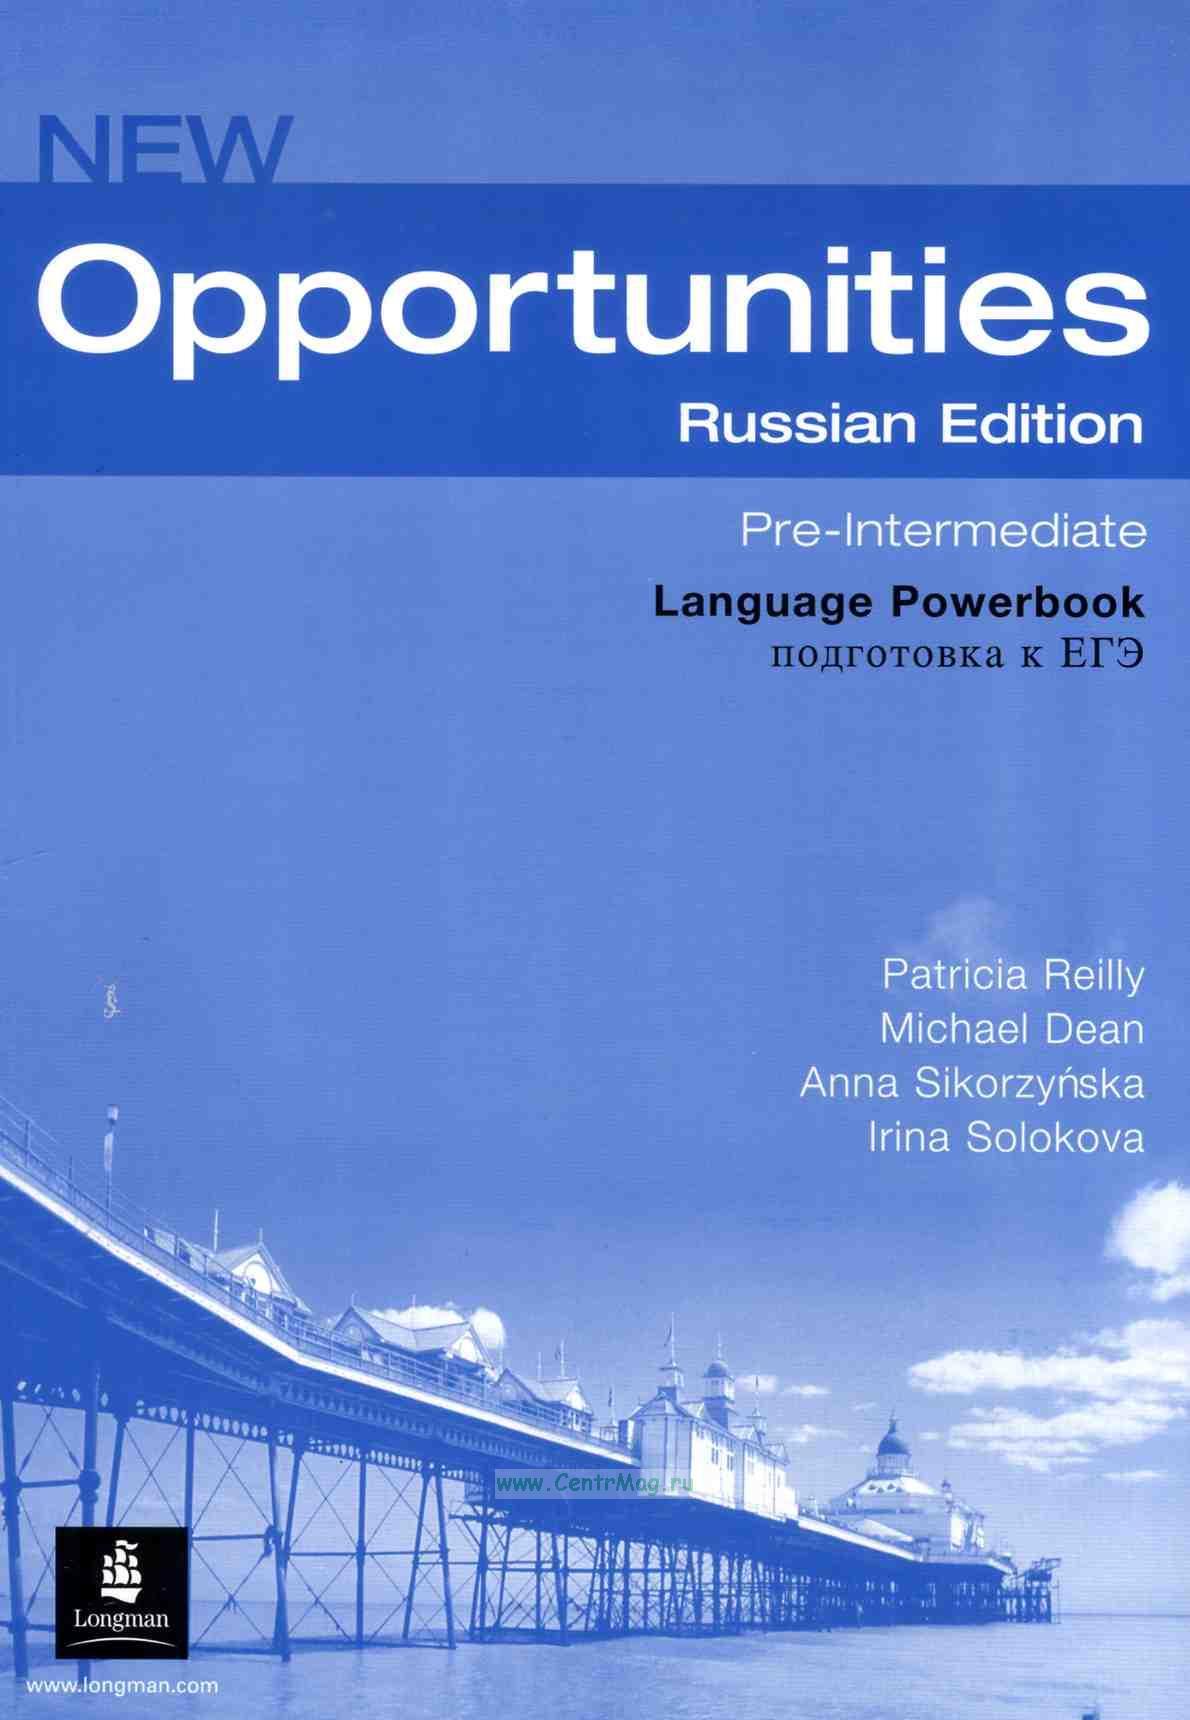 New Opportunities Russian Edition. Pre-Intermediate. Language Powerbook. Подготовка к ЕГЭ